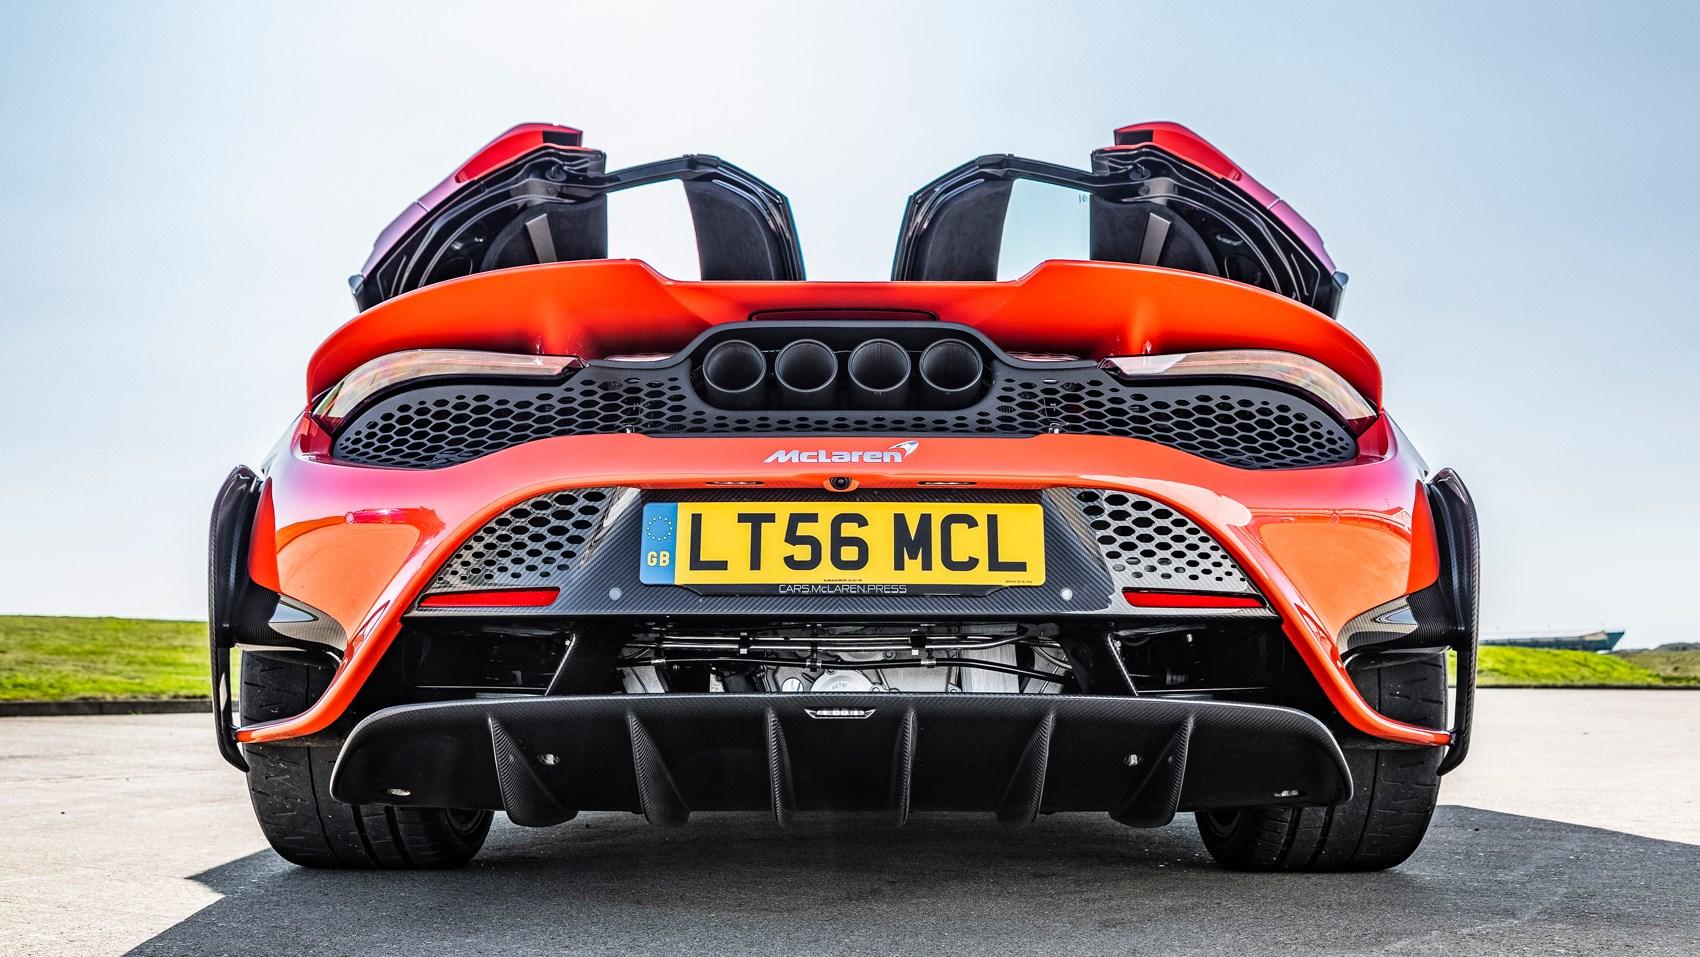 765lt rear